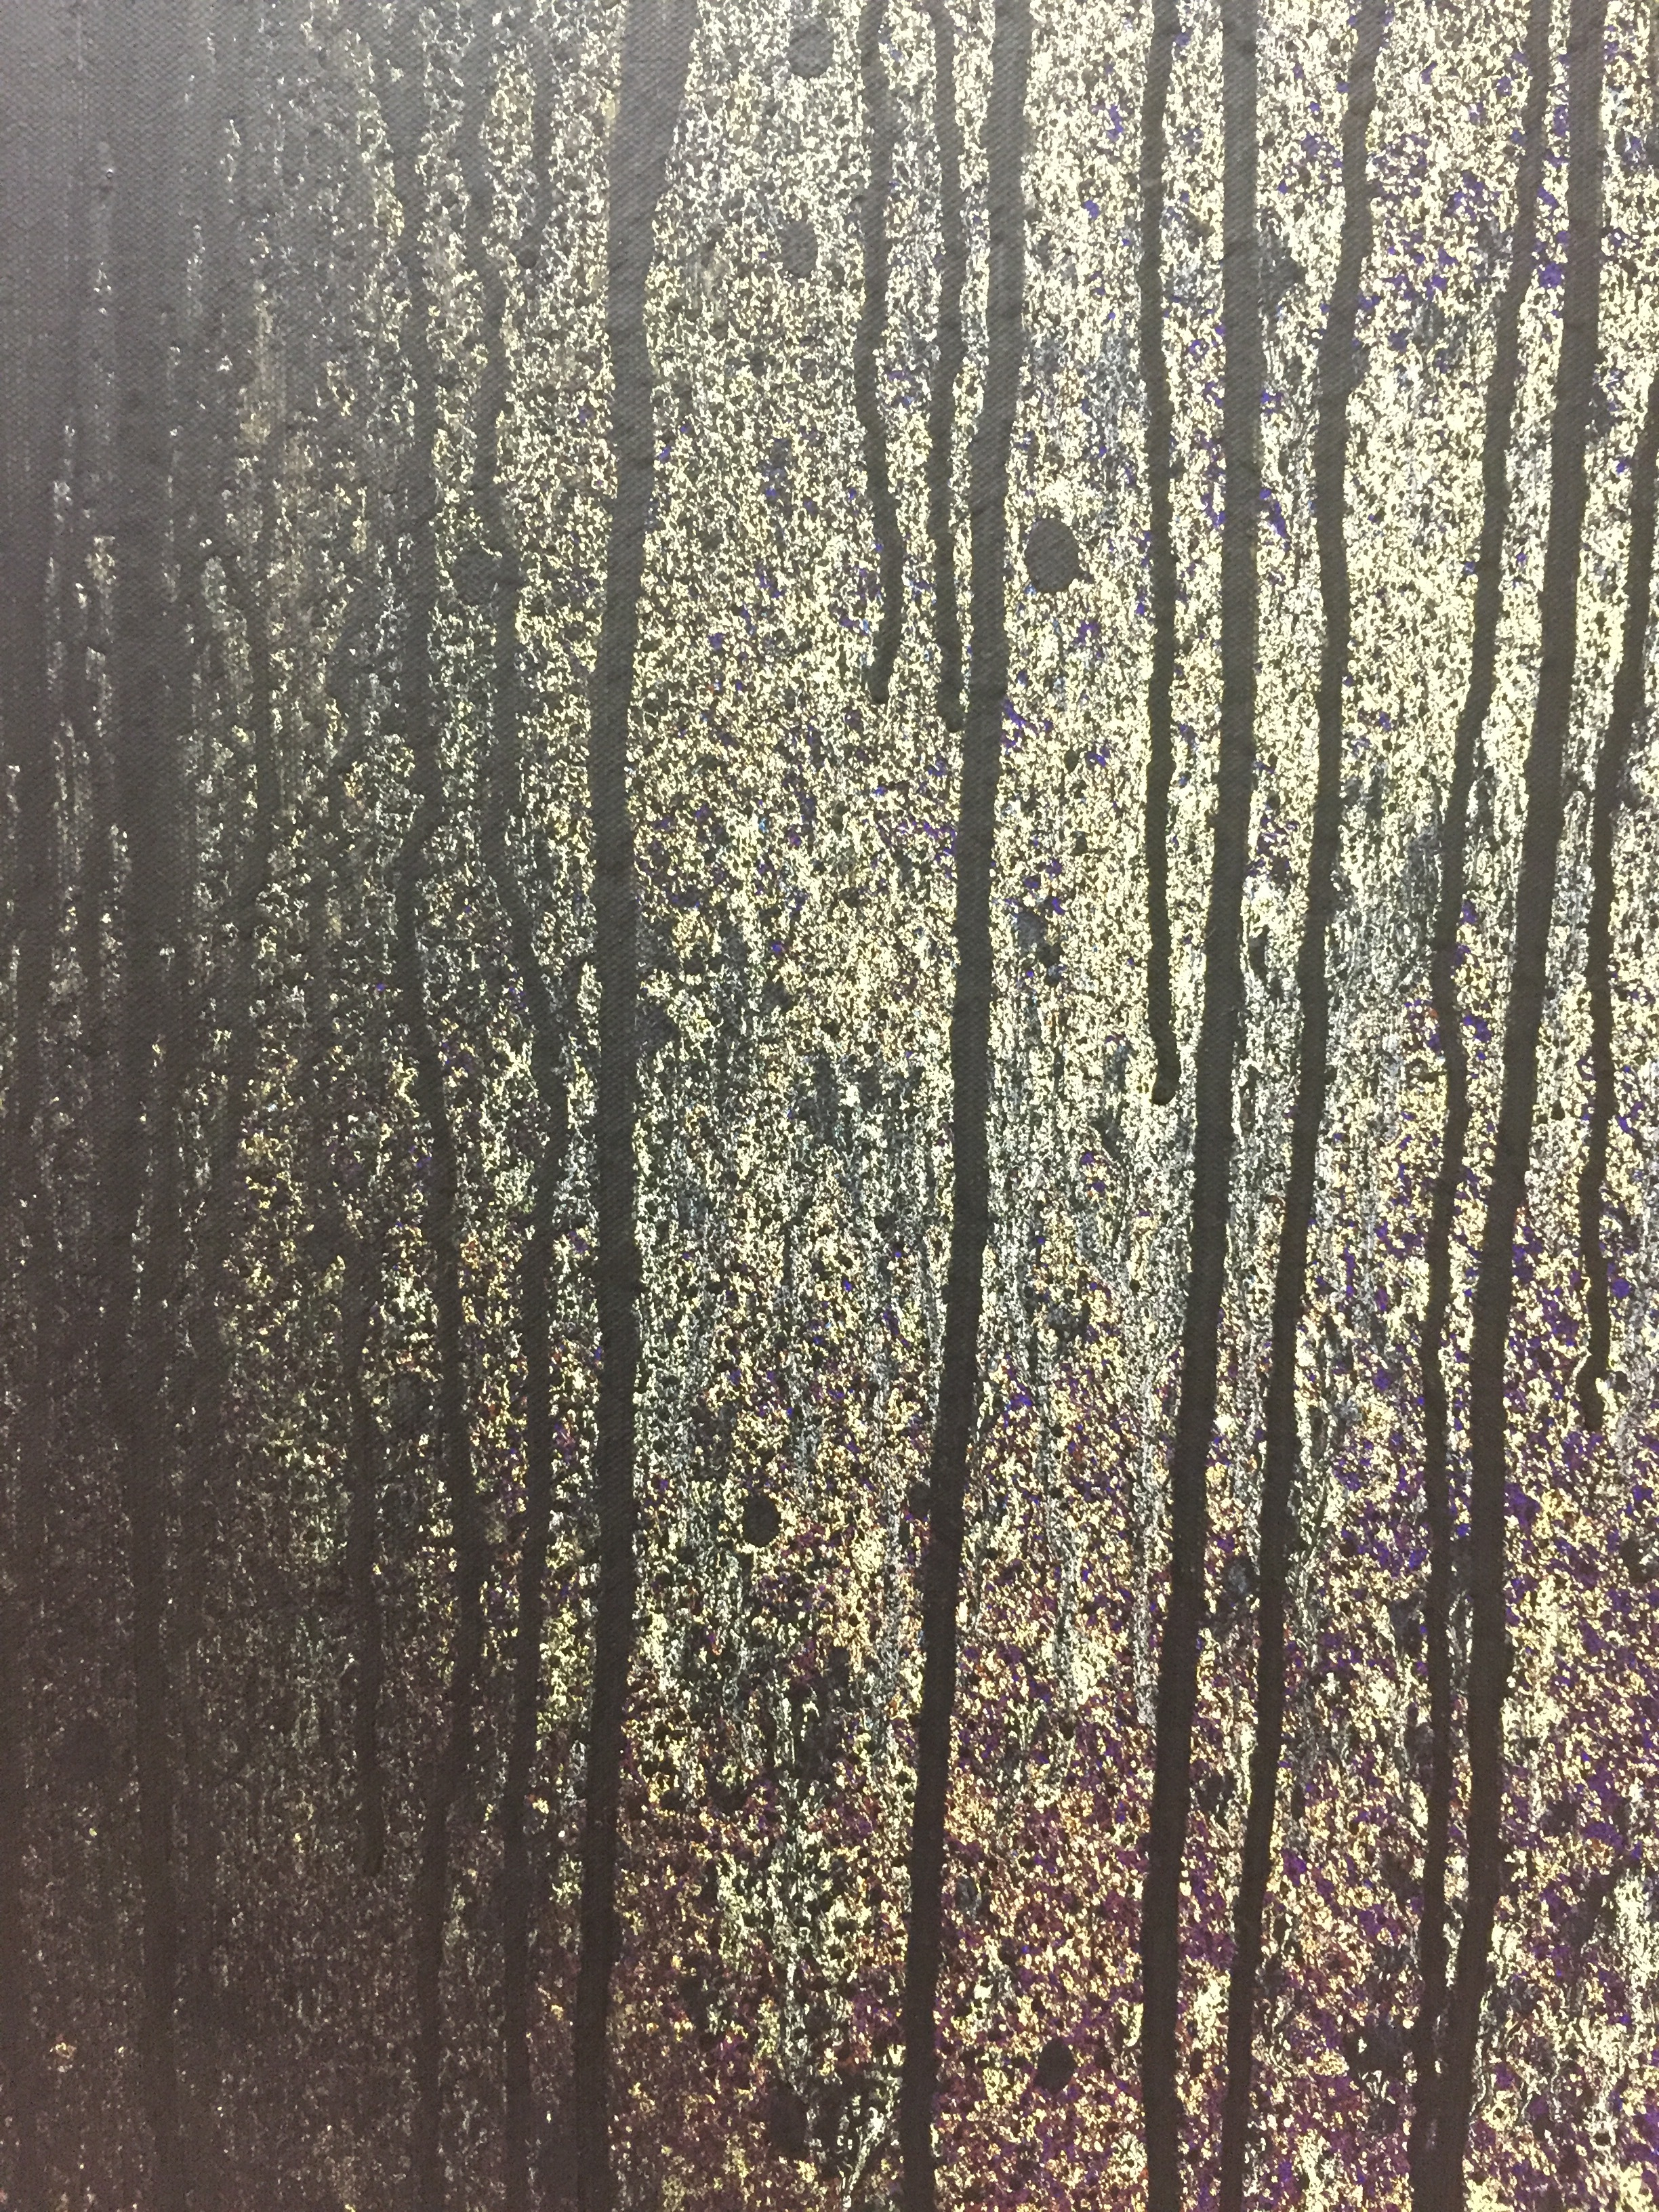 Closeup of Hartung painting